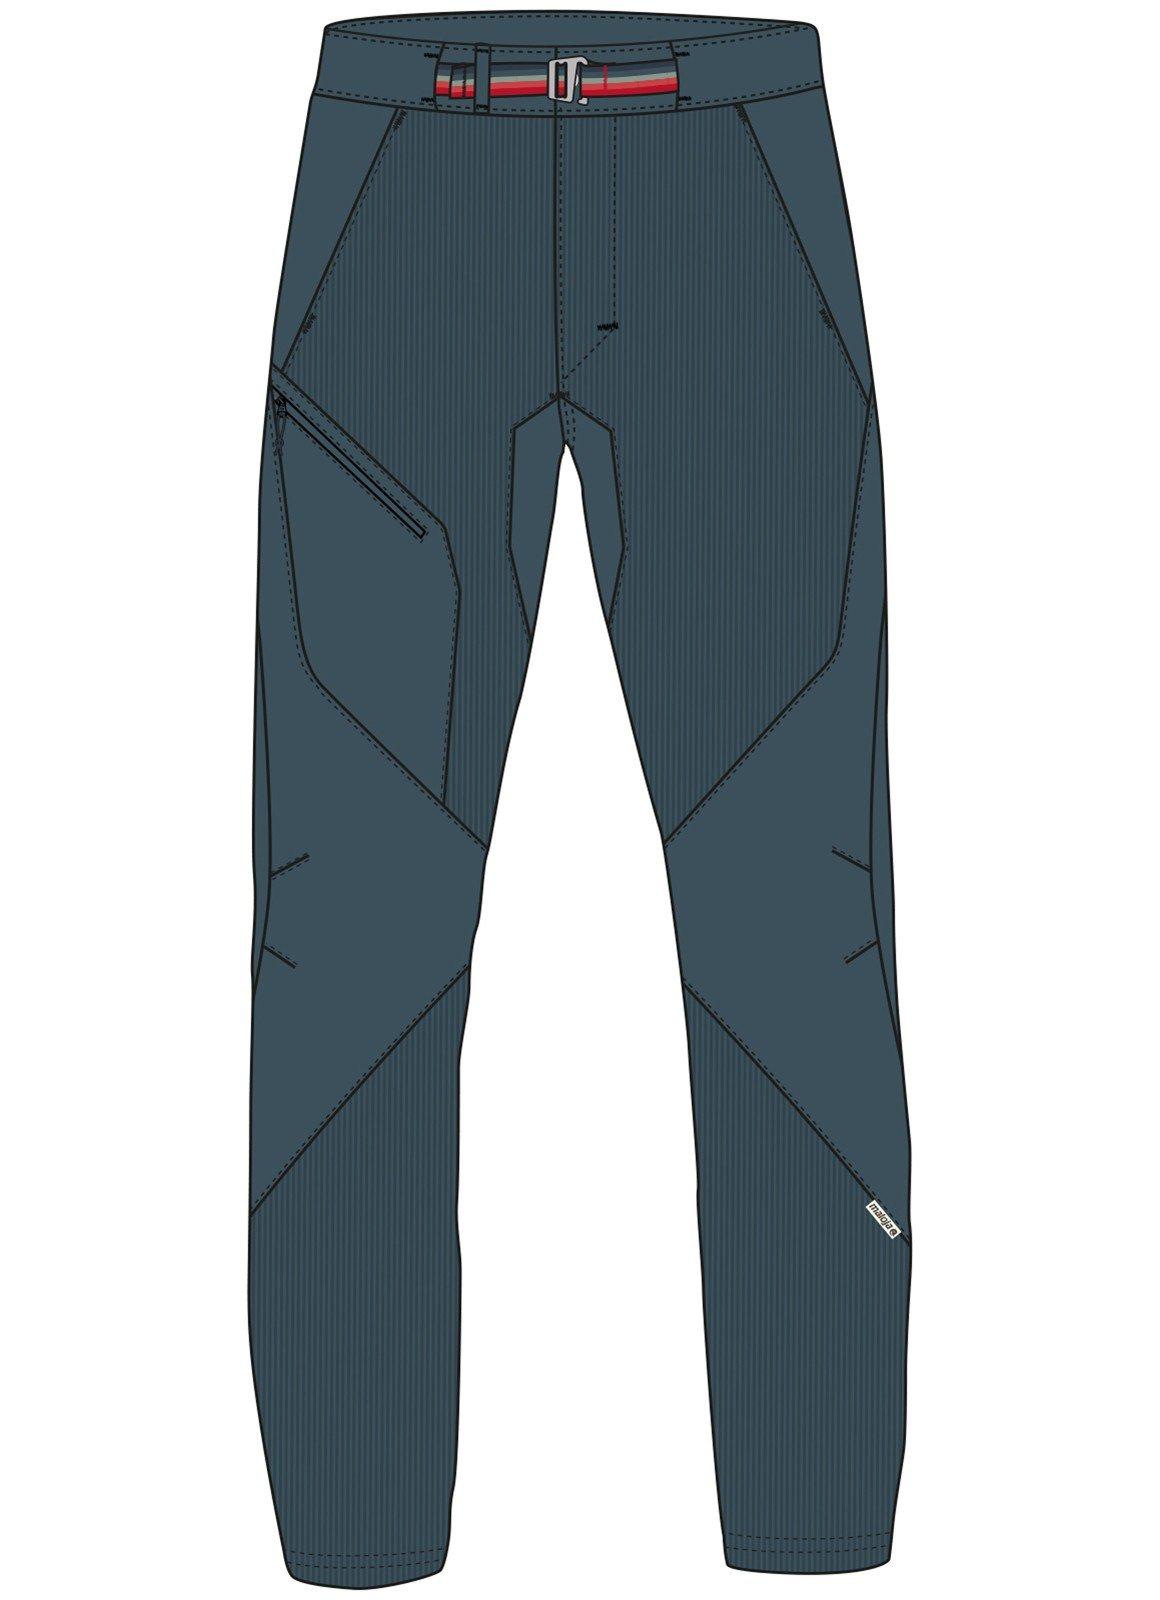 Maloja Multi Sport Pantaloni slittamento pantaloni per il tempo libero blu bludenzm. Stretch 24262Â